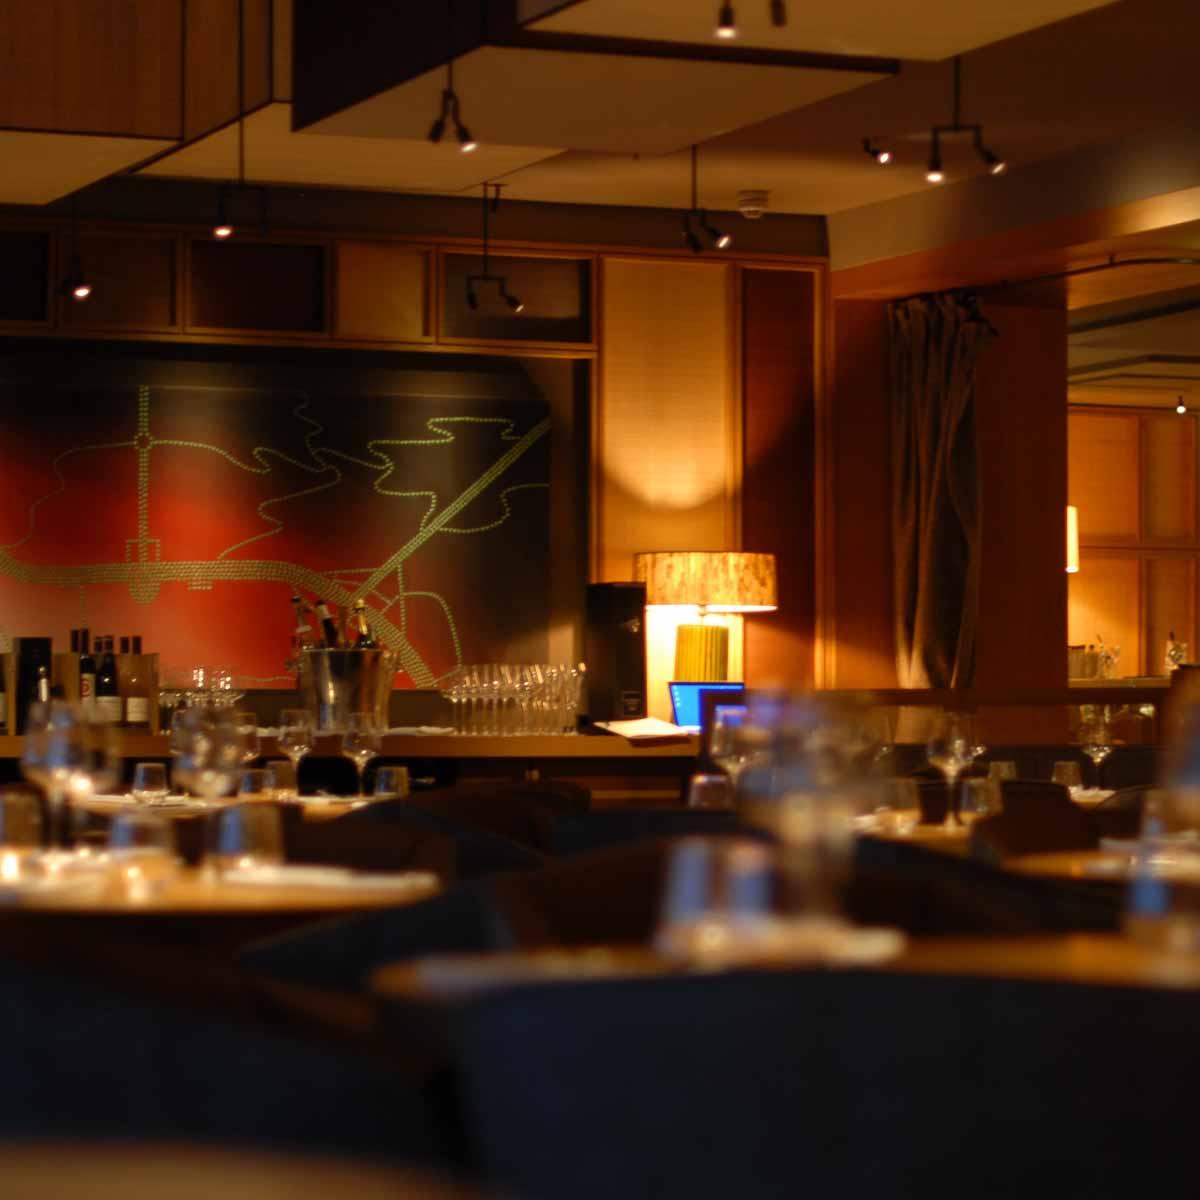 Restaurant The Louis Grillroom in München